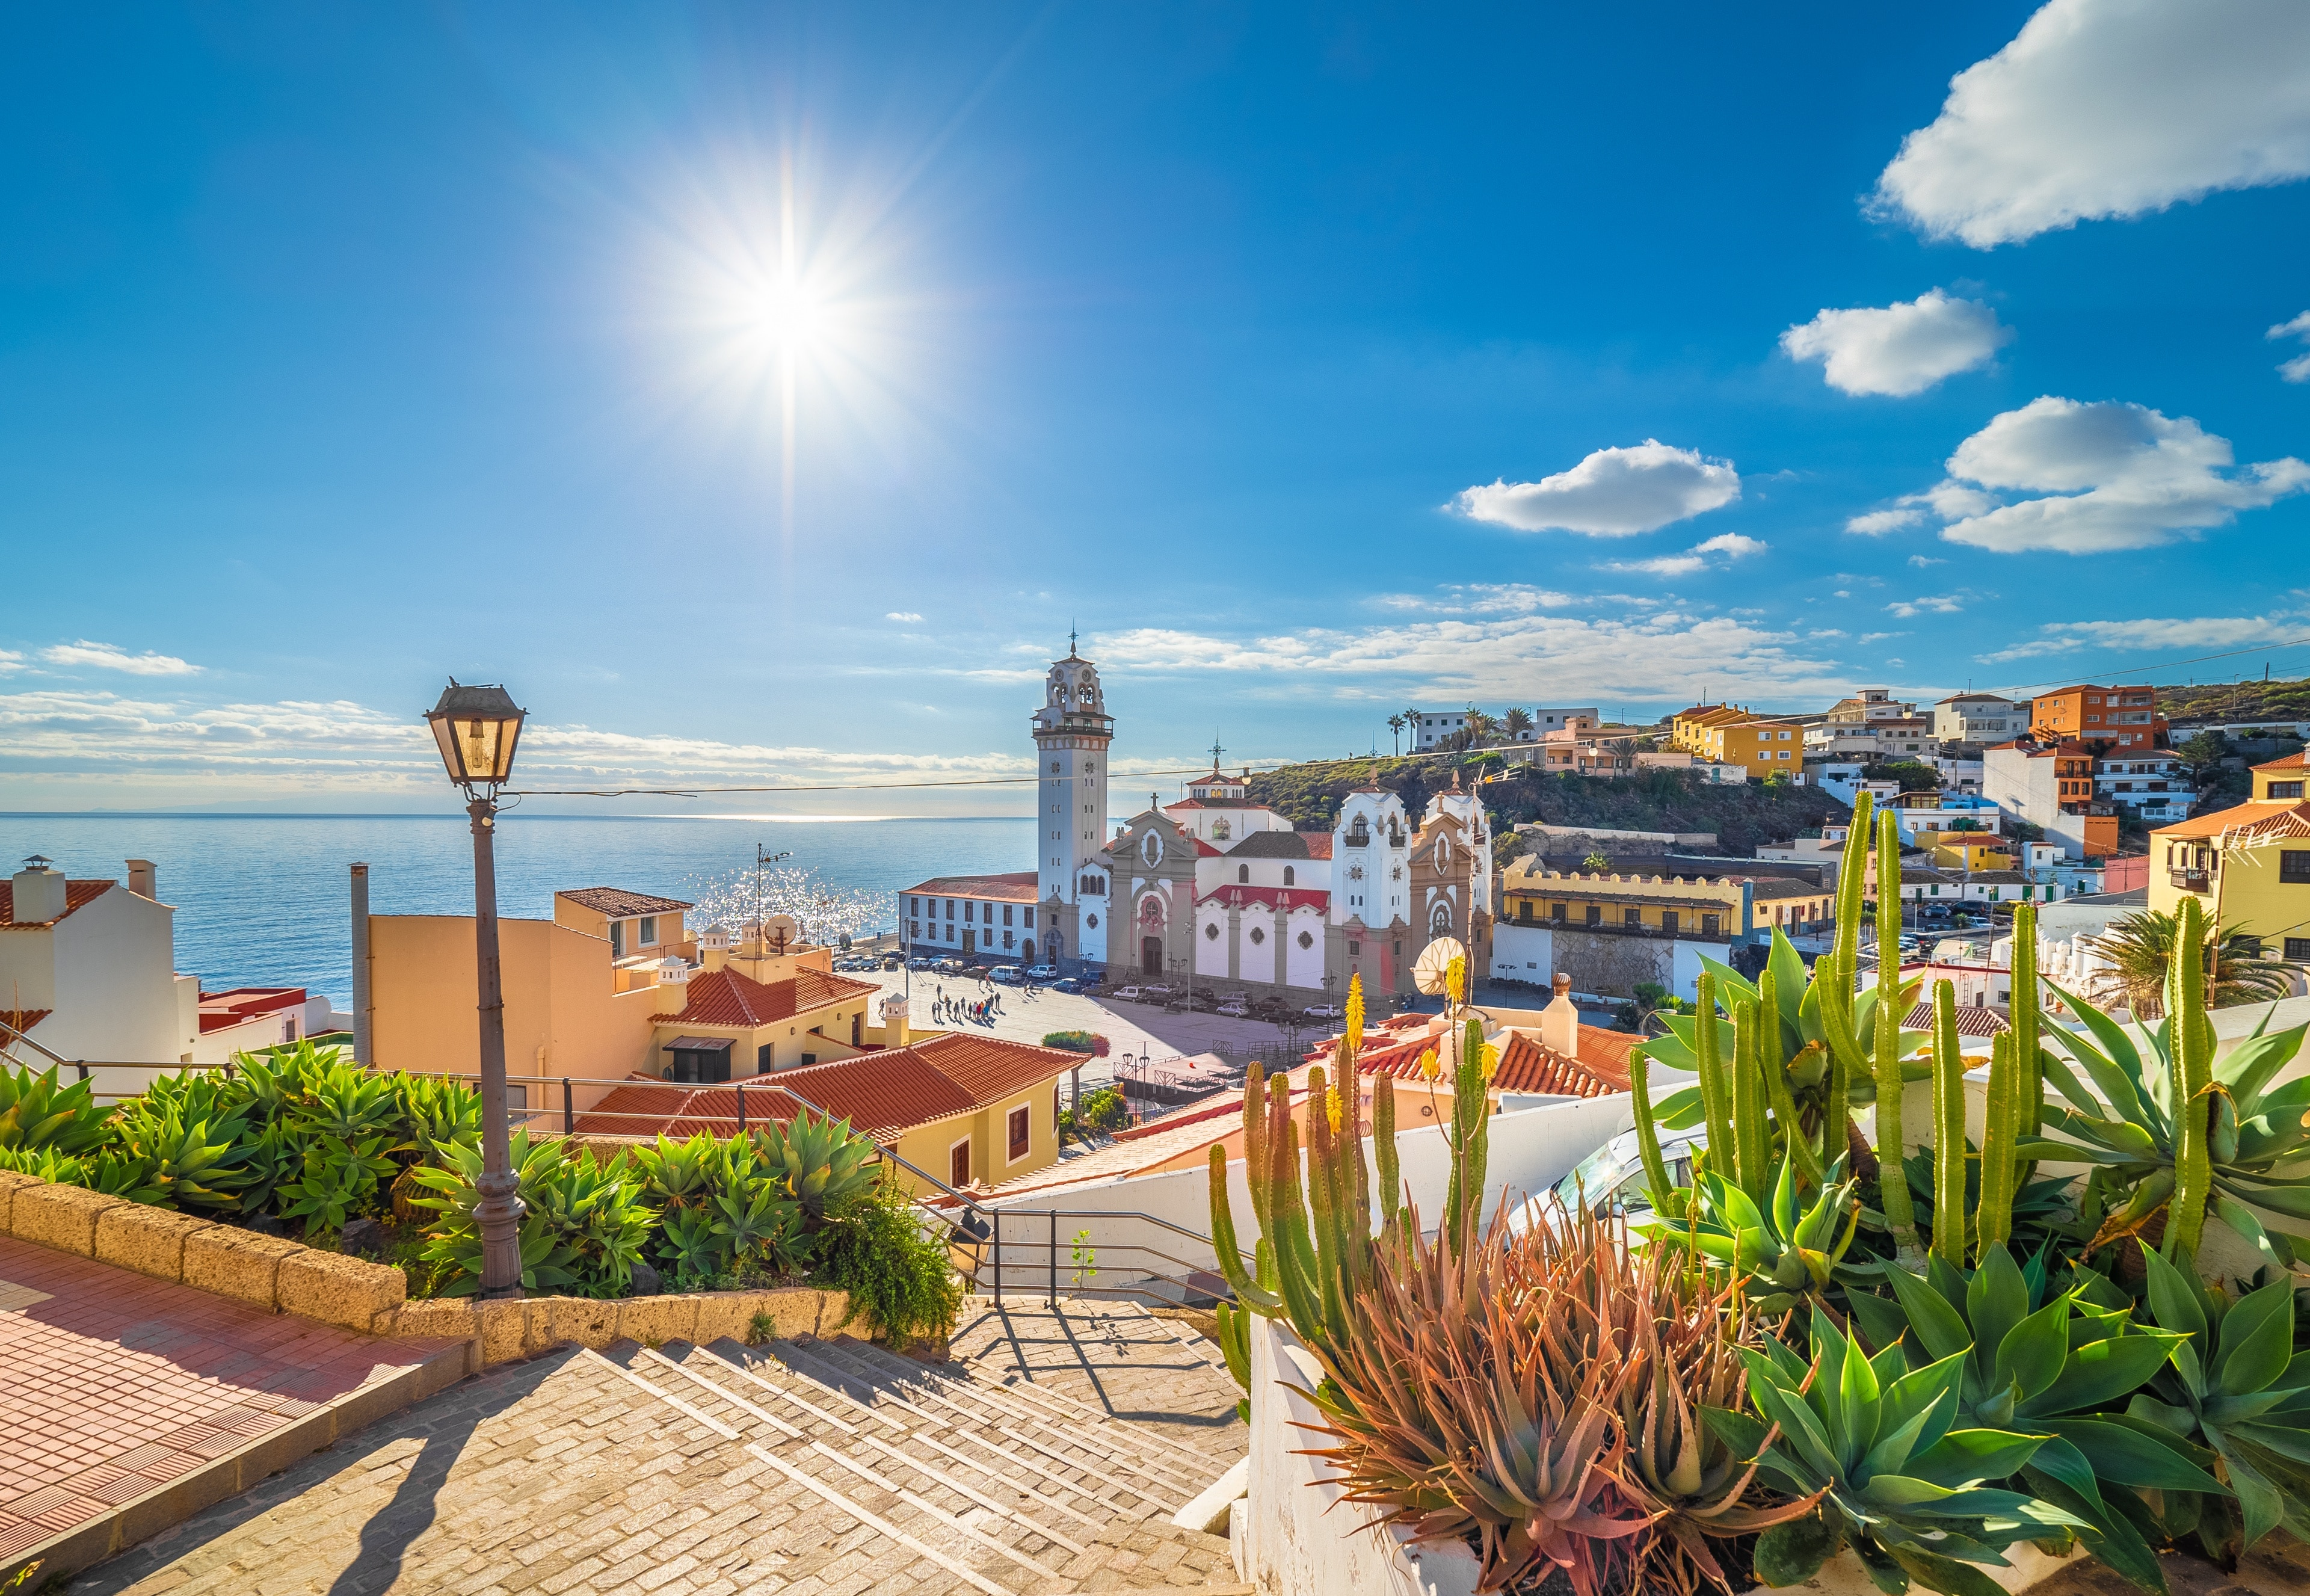 Candelaria, Canary Islands, Spain